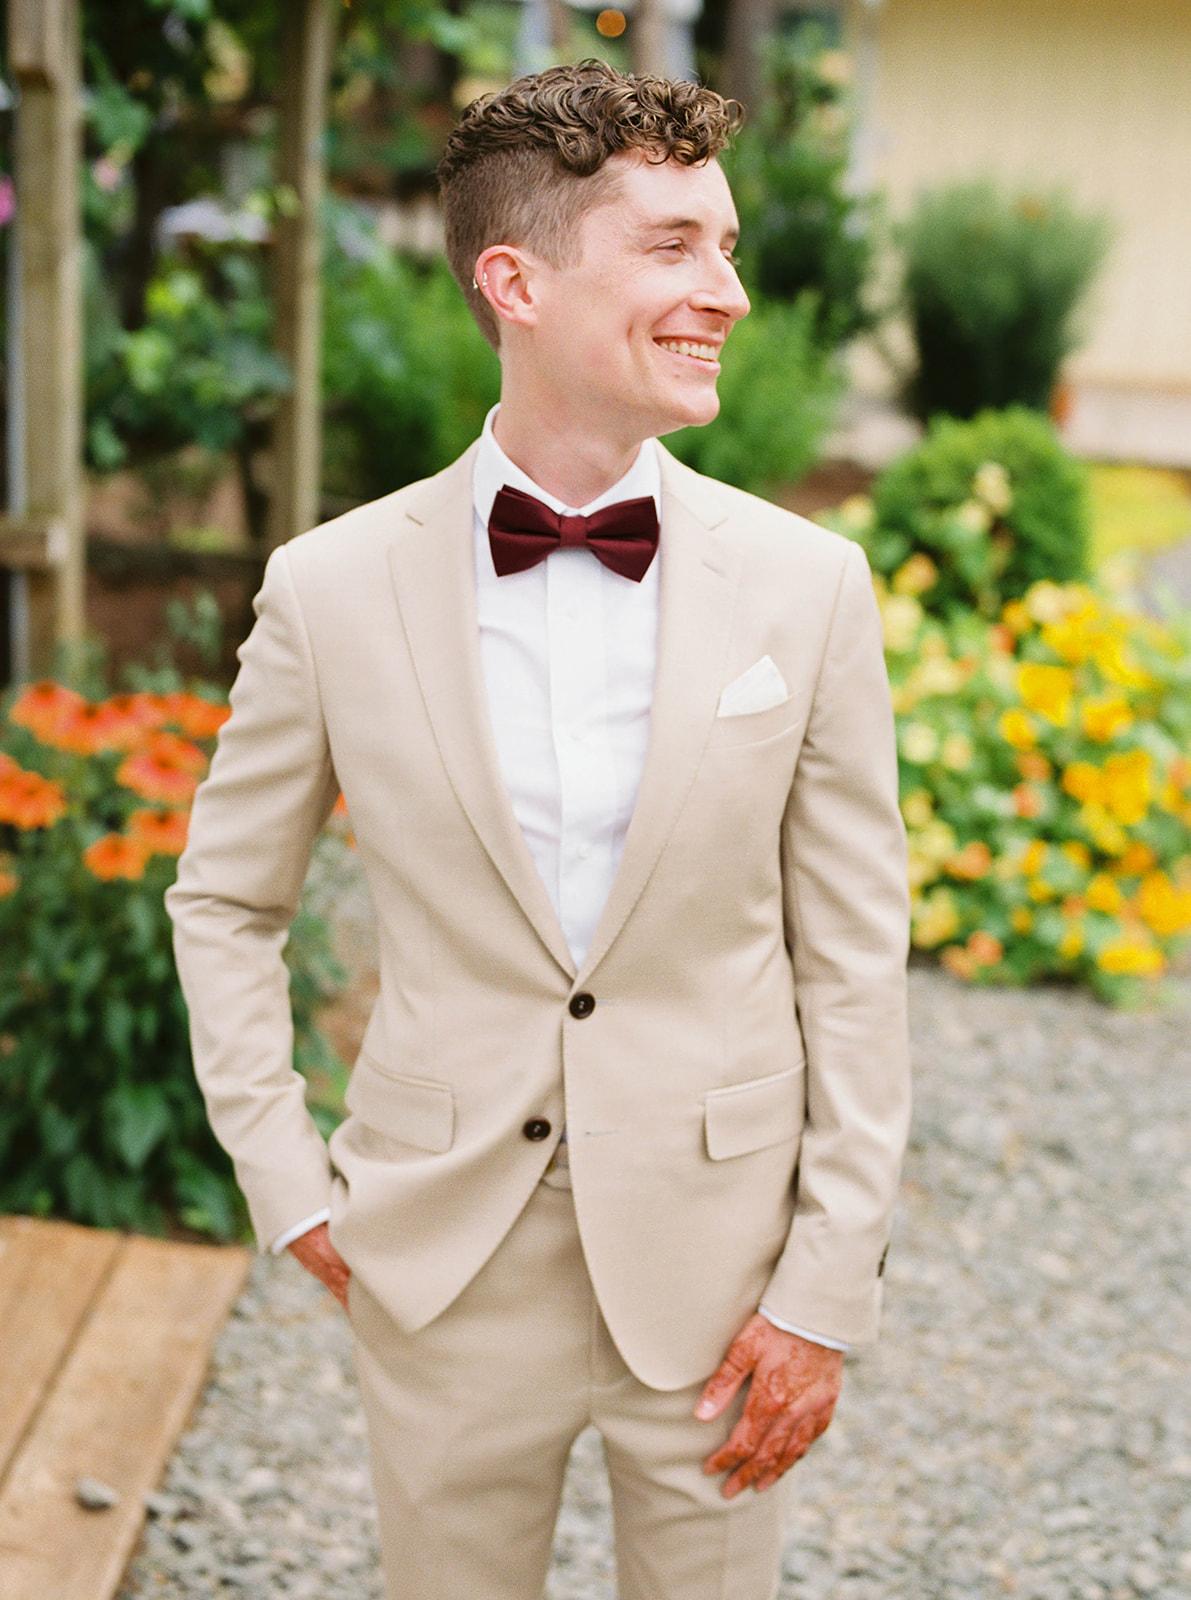 justin kevin wedding justin posing in suit